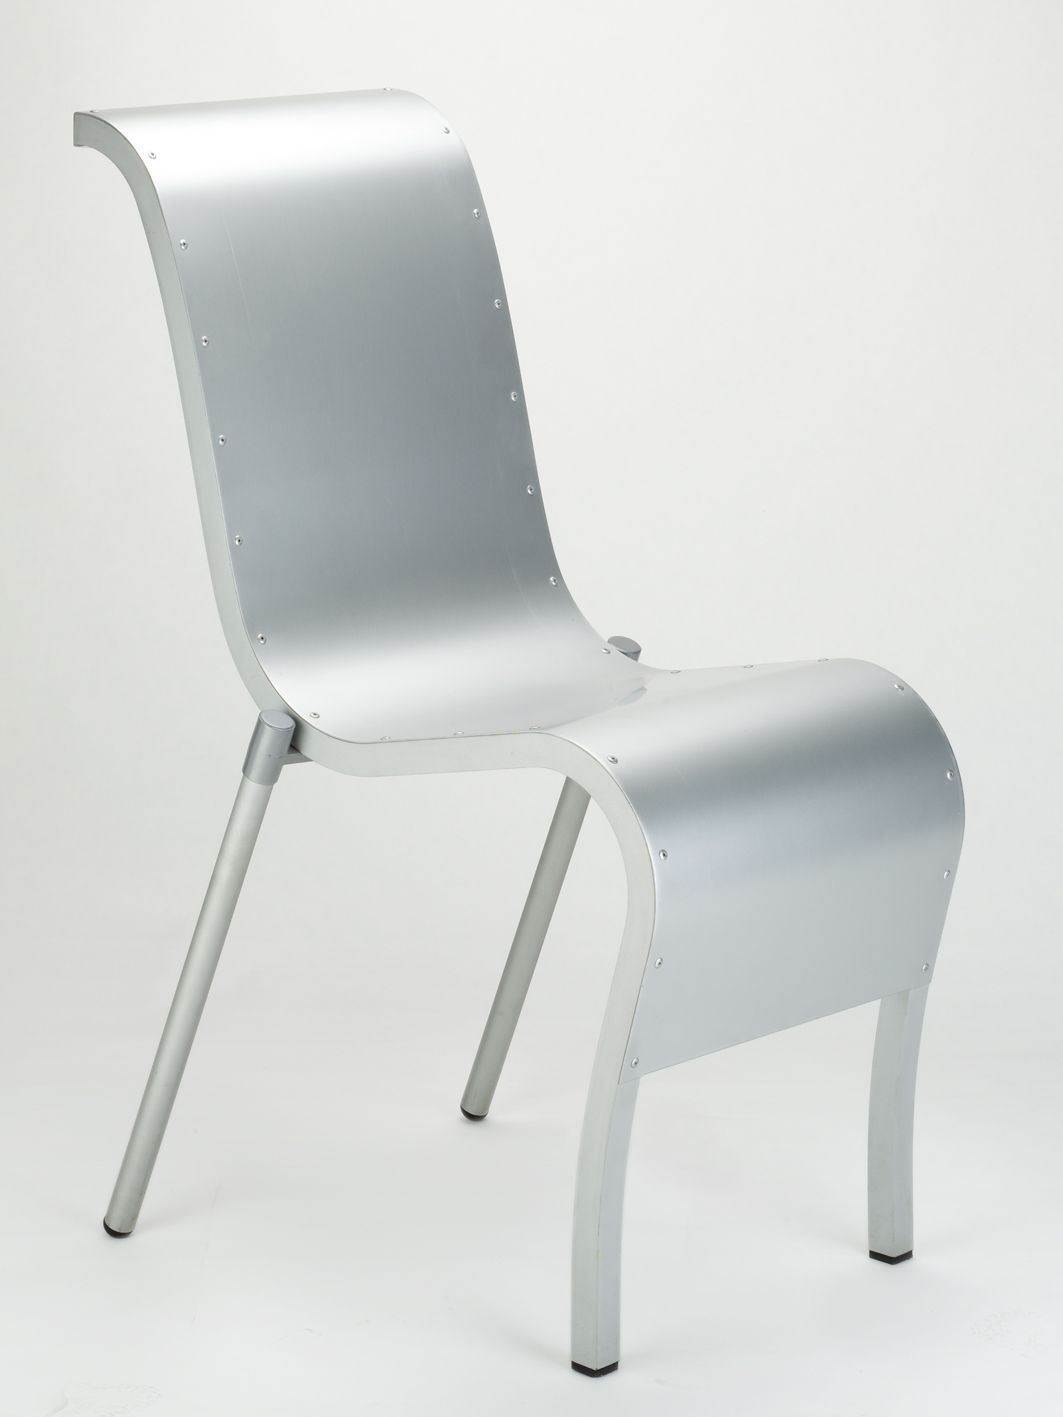 philipp starck romantica 1987 sillas pinterest sillas. Black Bedroom Furniture Sets. Home Design Ideas